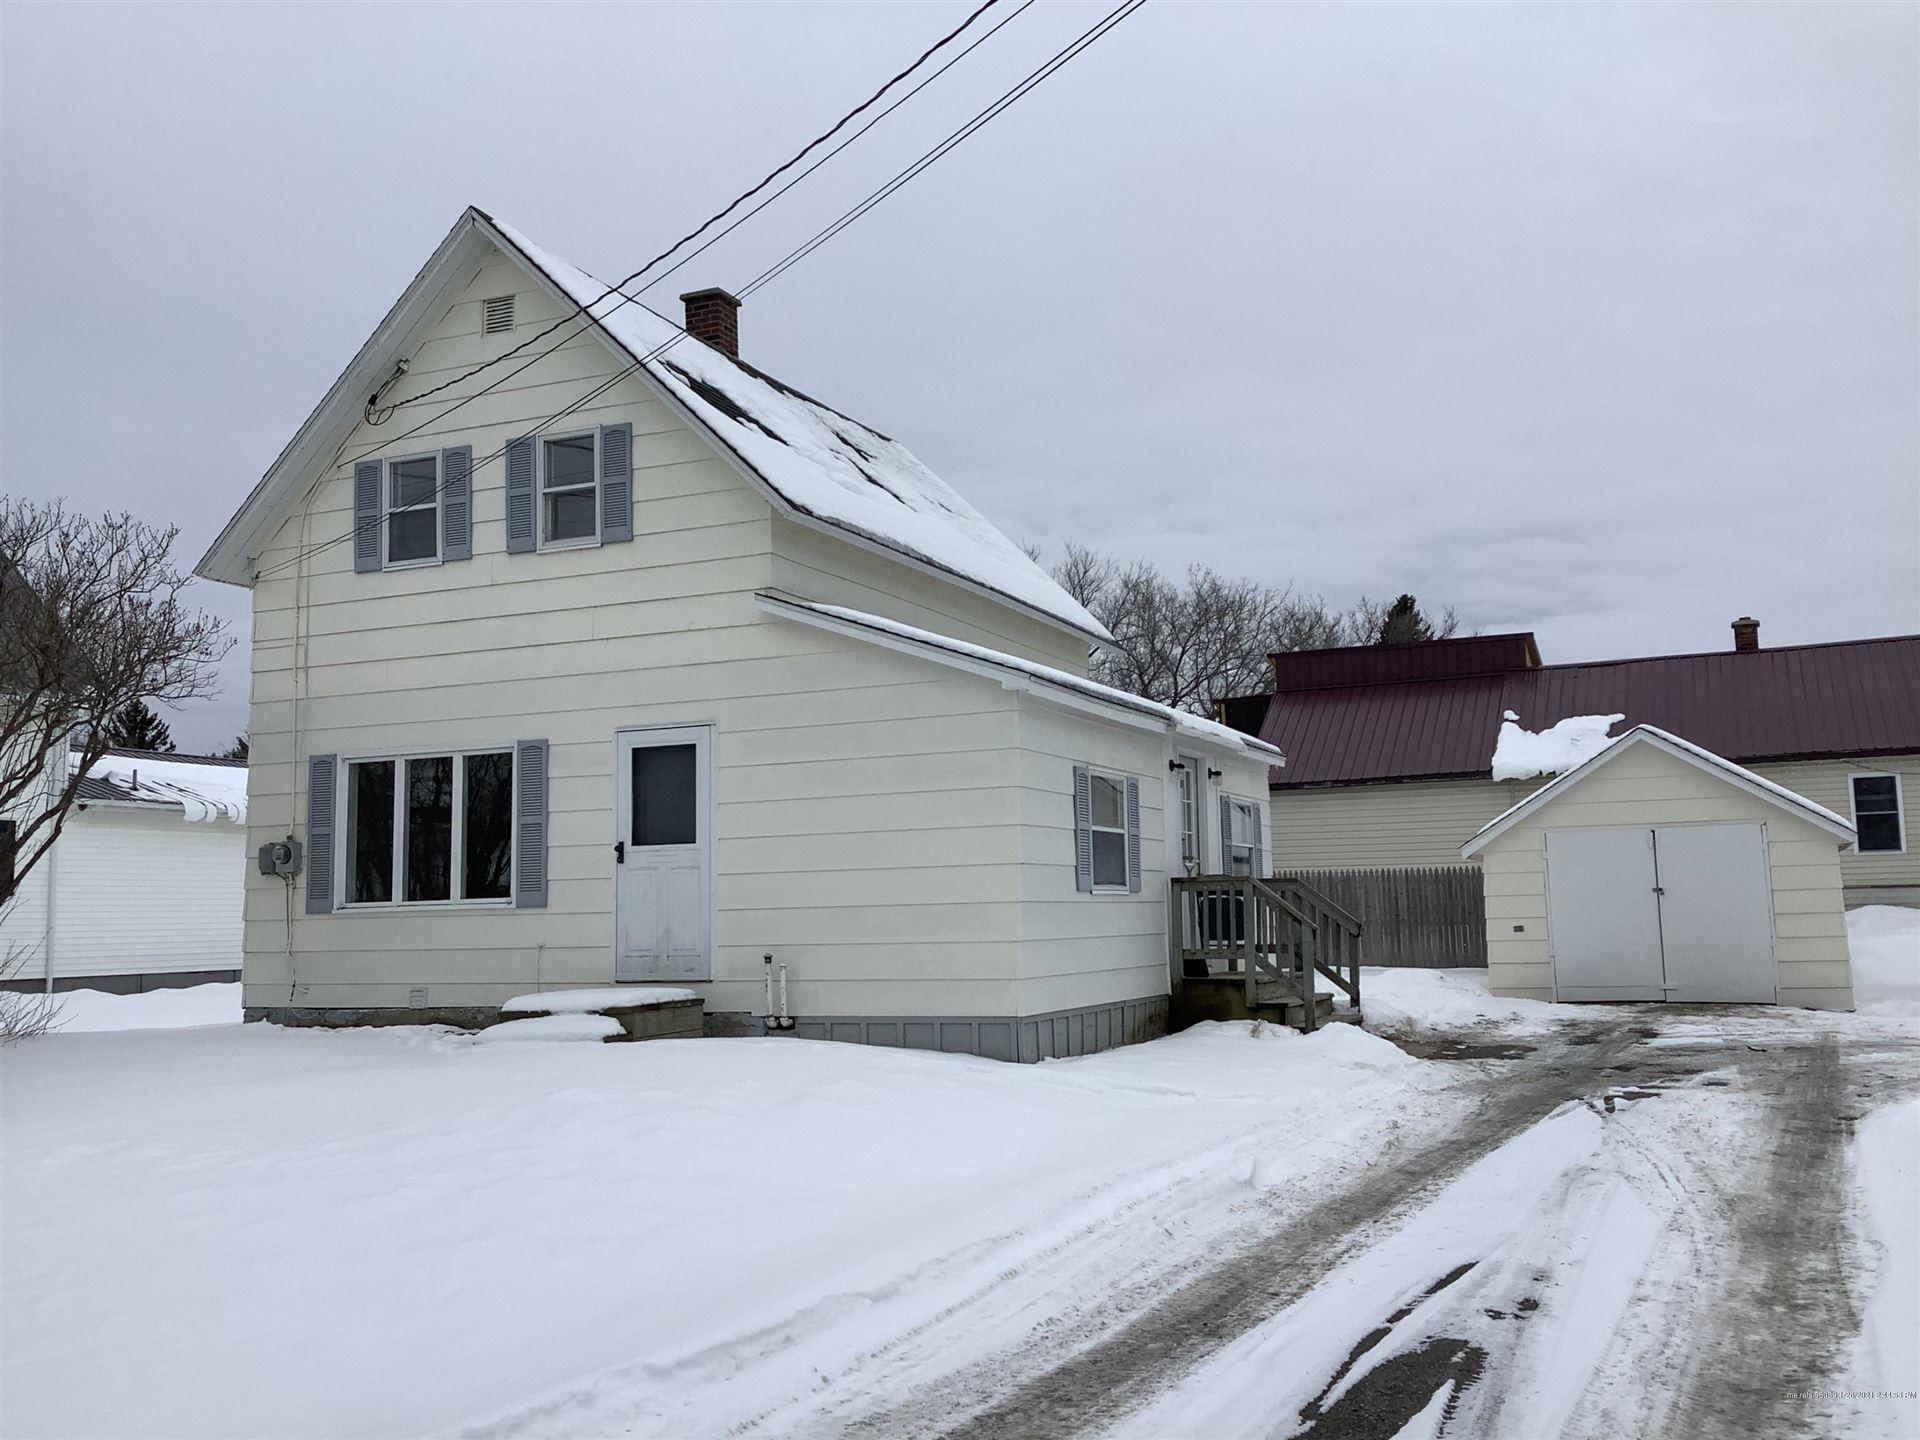 Photo of 169 Main Street, Fort Fairfield, ME 04742 (MLS # 1480603)